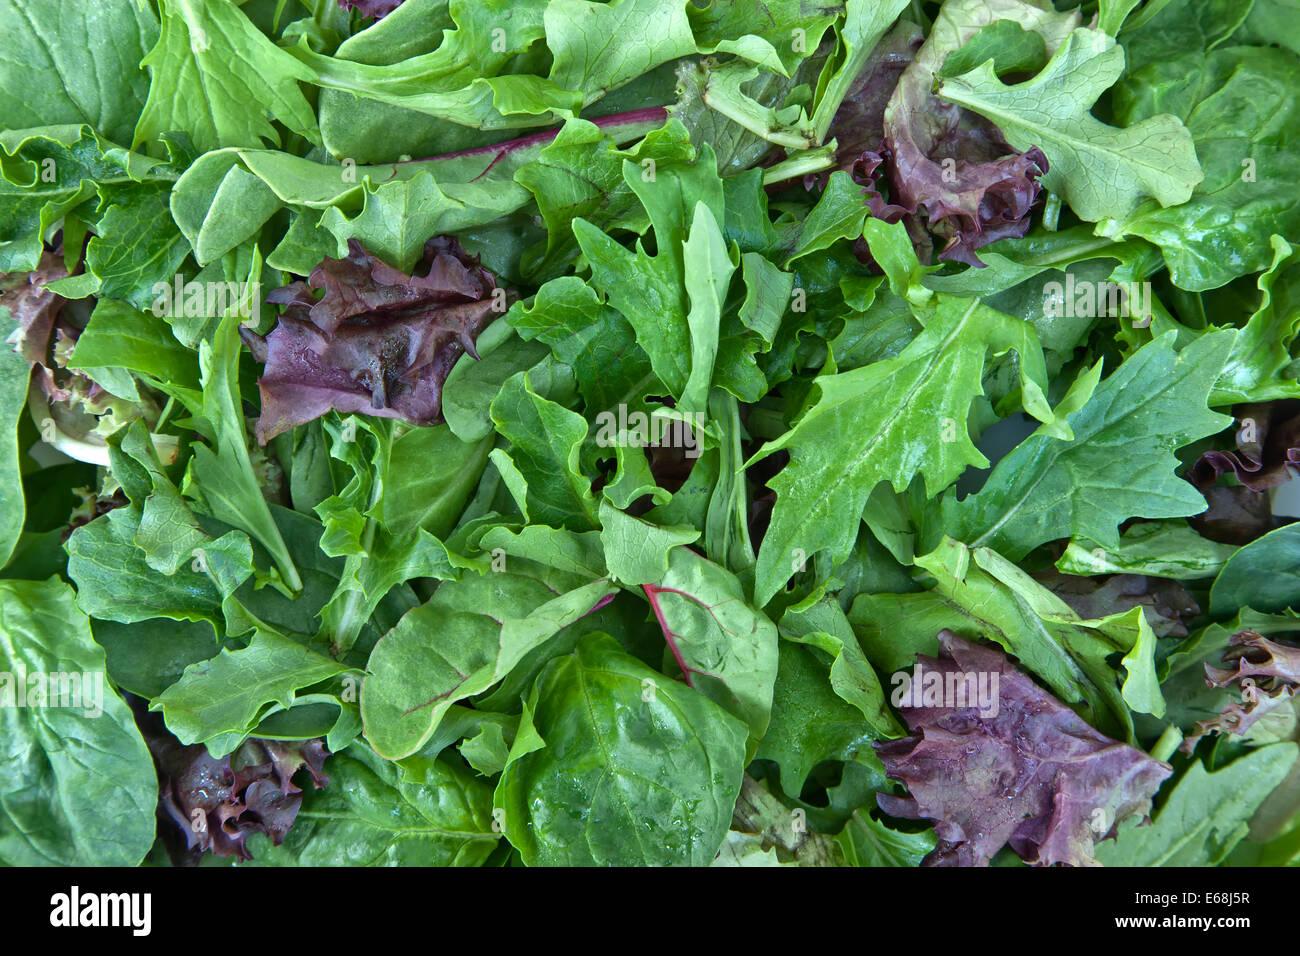 Organic 'baby lettuce' spring mix. - Stock Image